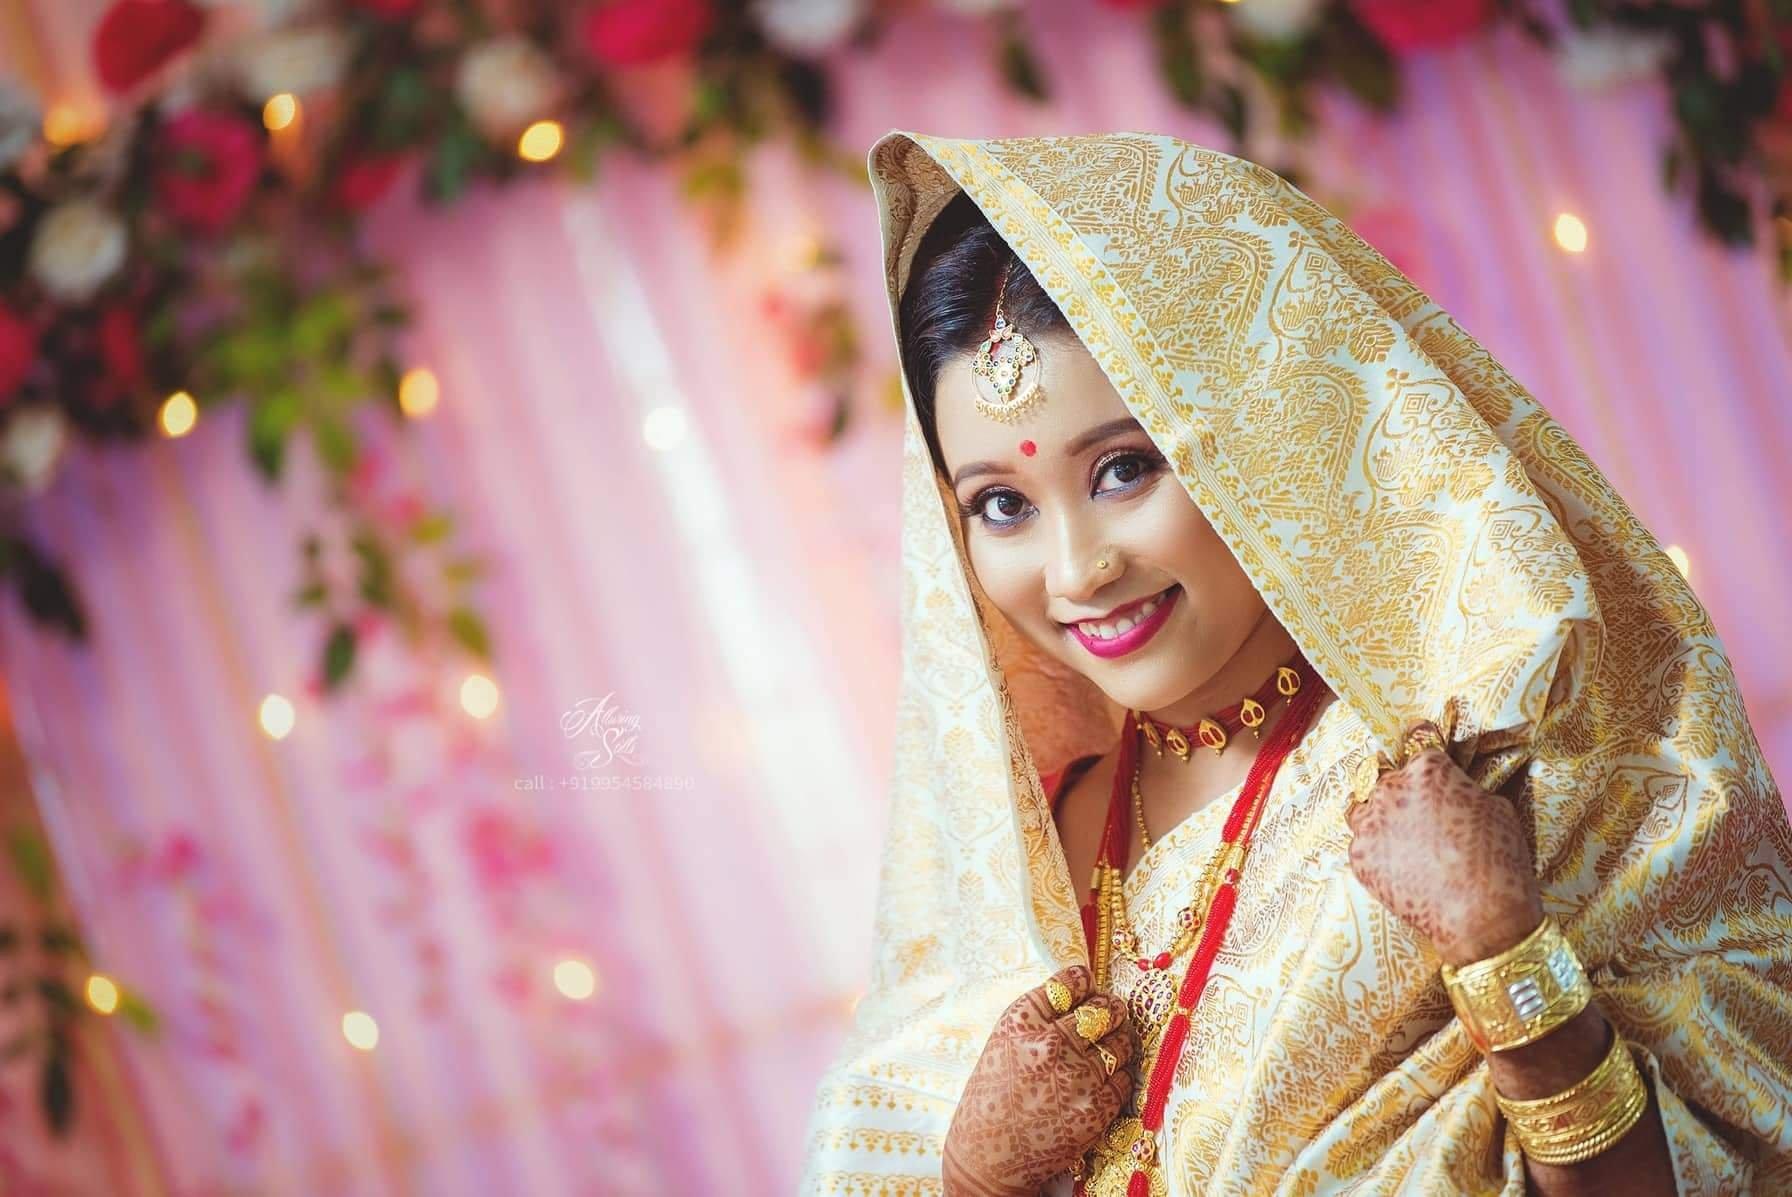 Assamese bride flaunting the ceremonial white paat mekhela chador